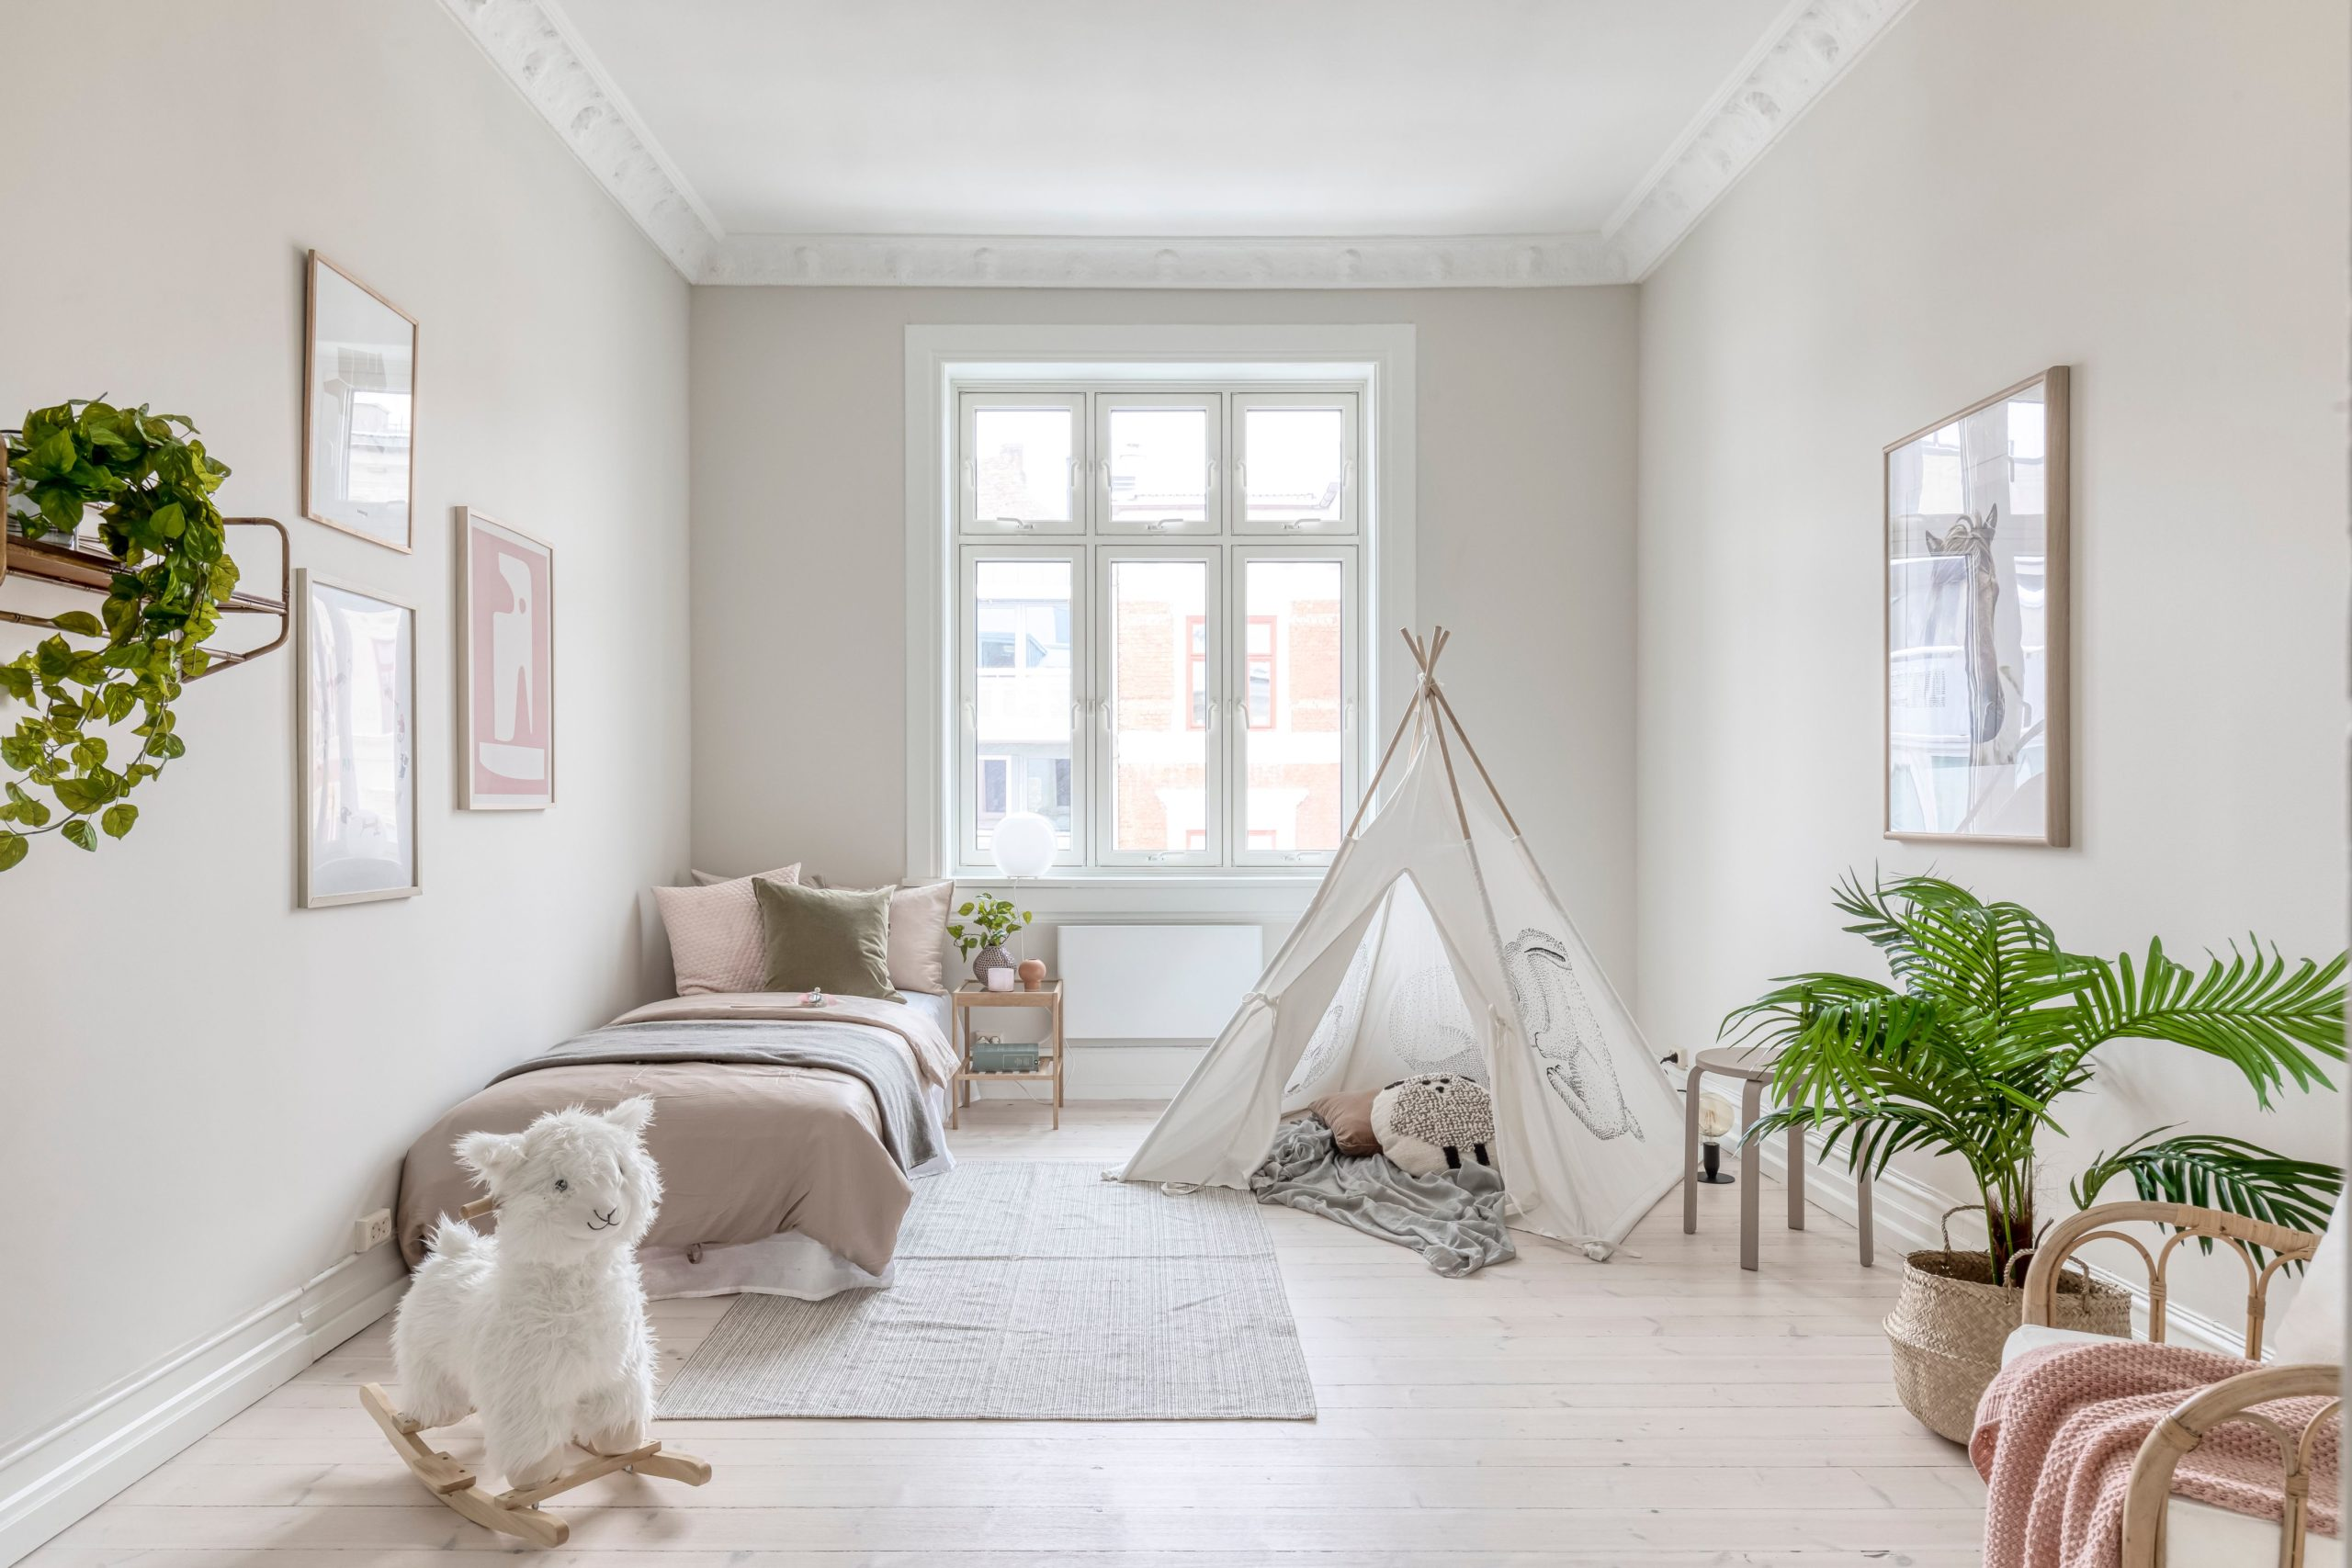 Stila interiør boligstyling design